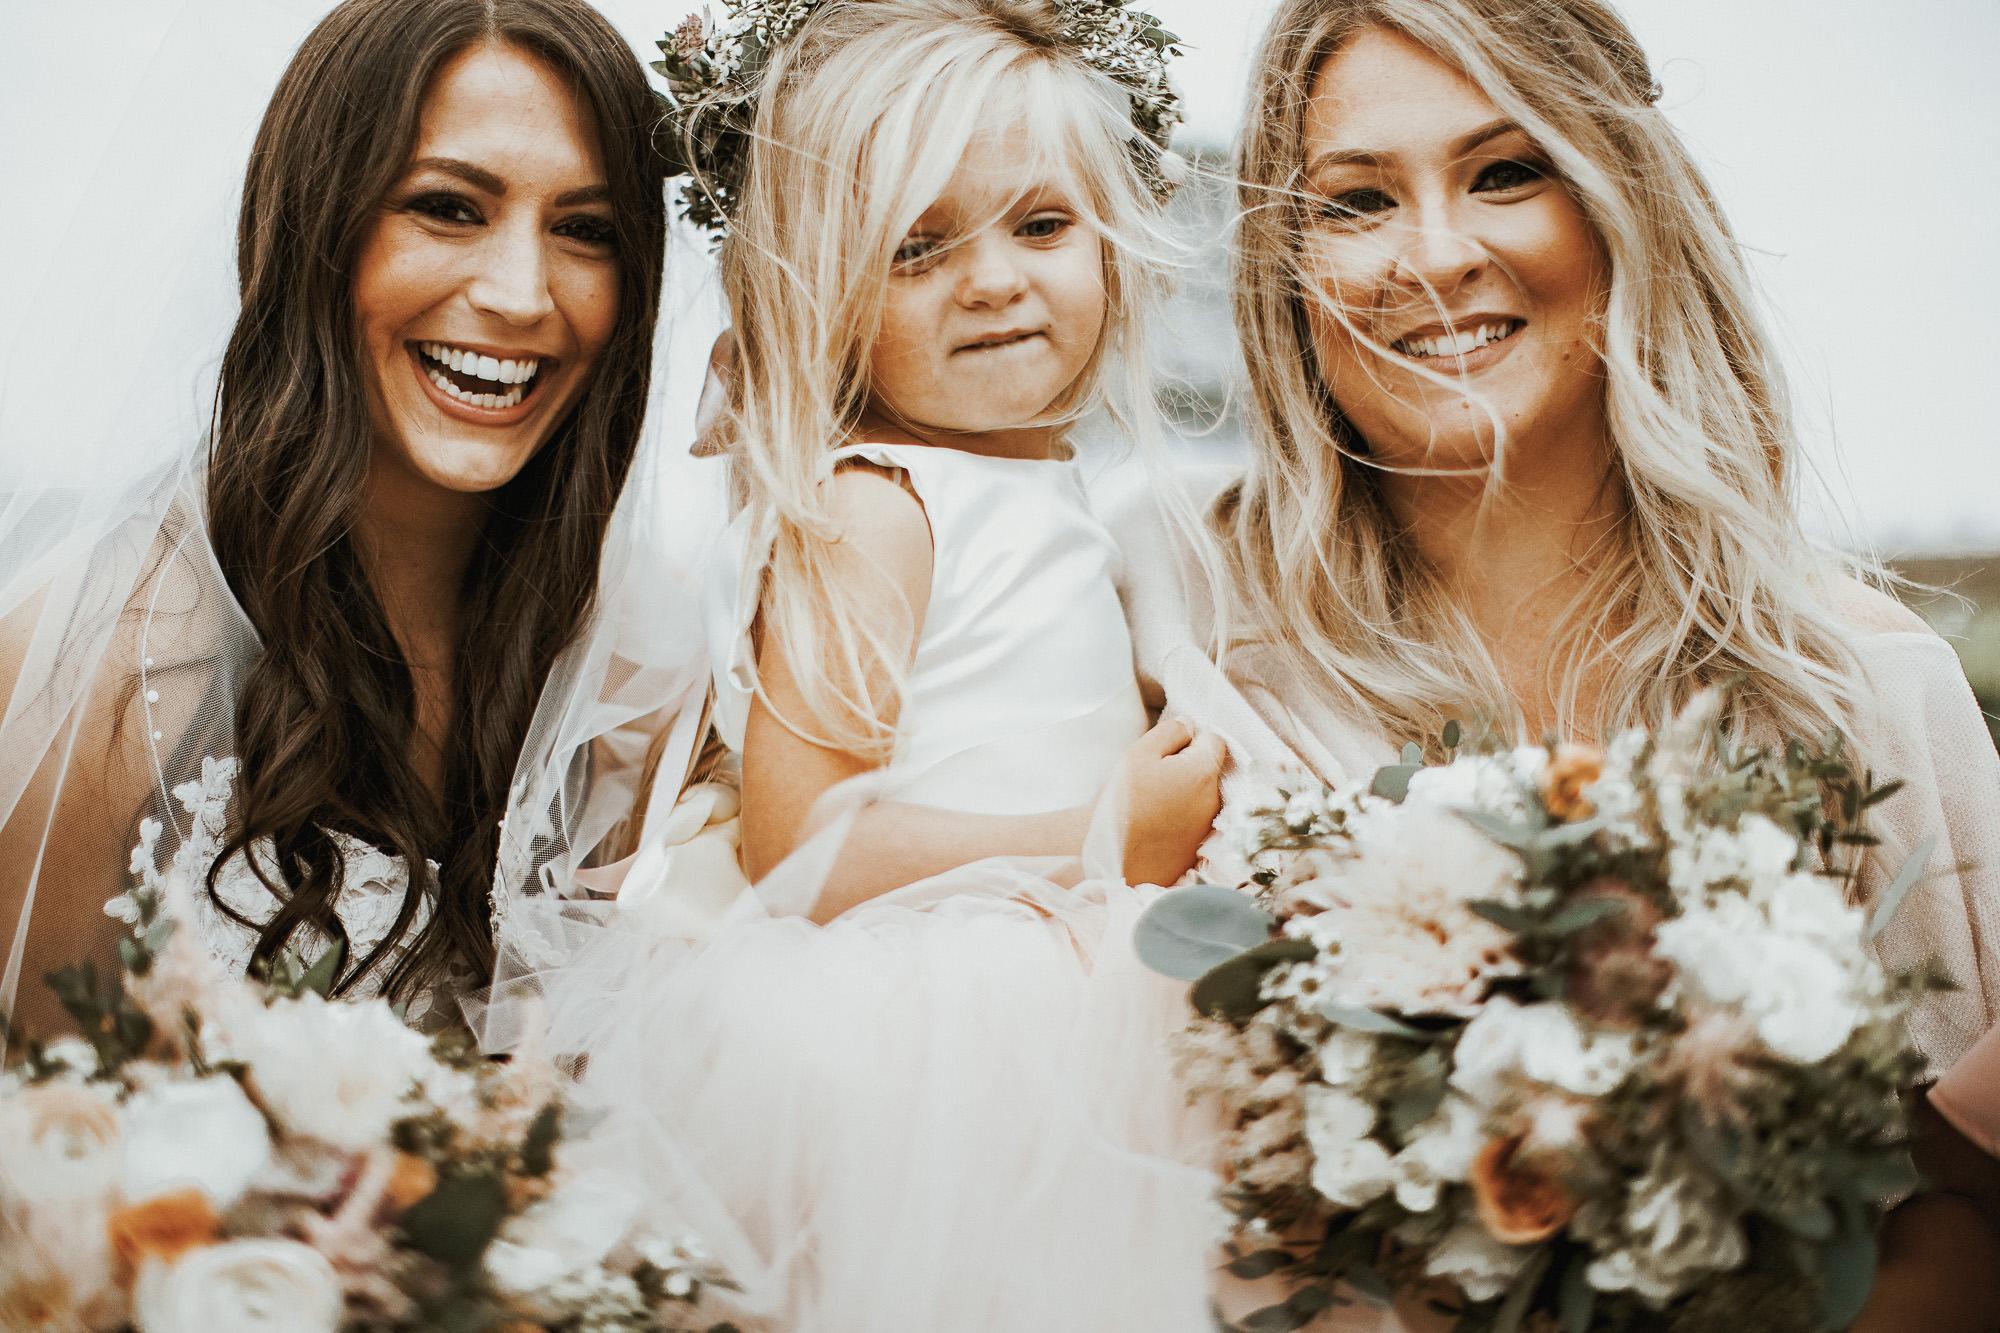 Our Wedding Photos | Pine Barren Beauty | wedding photo inspiration, bridal party colors, blush bridesmaids dresses, bridal party photos, flower girl dress